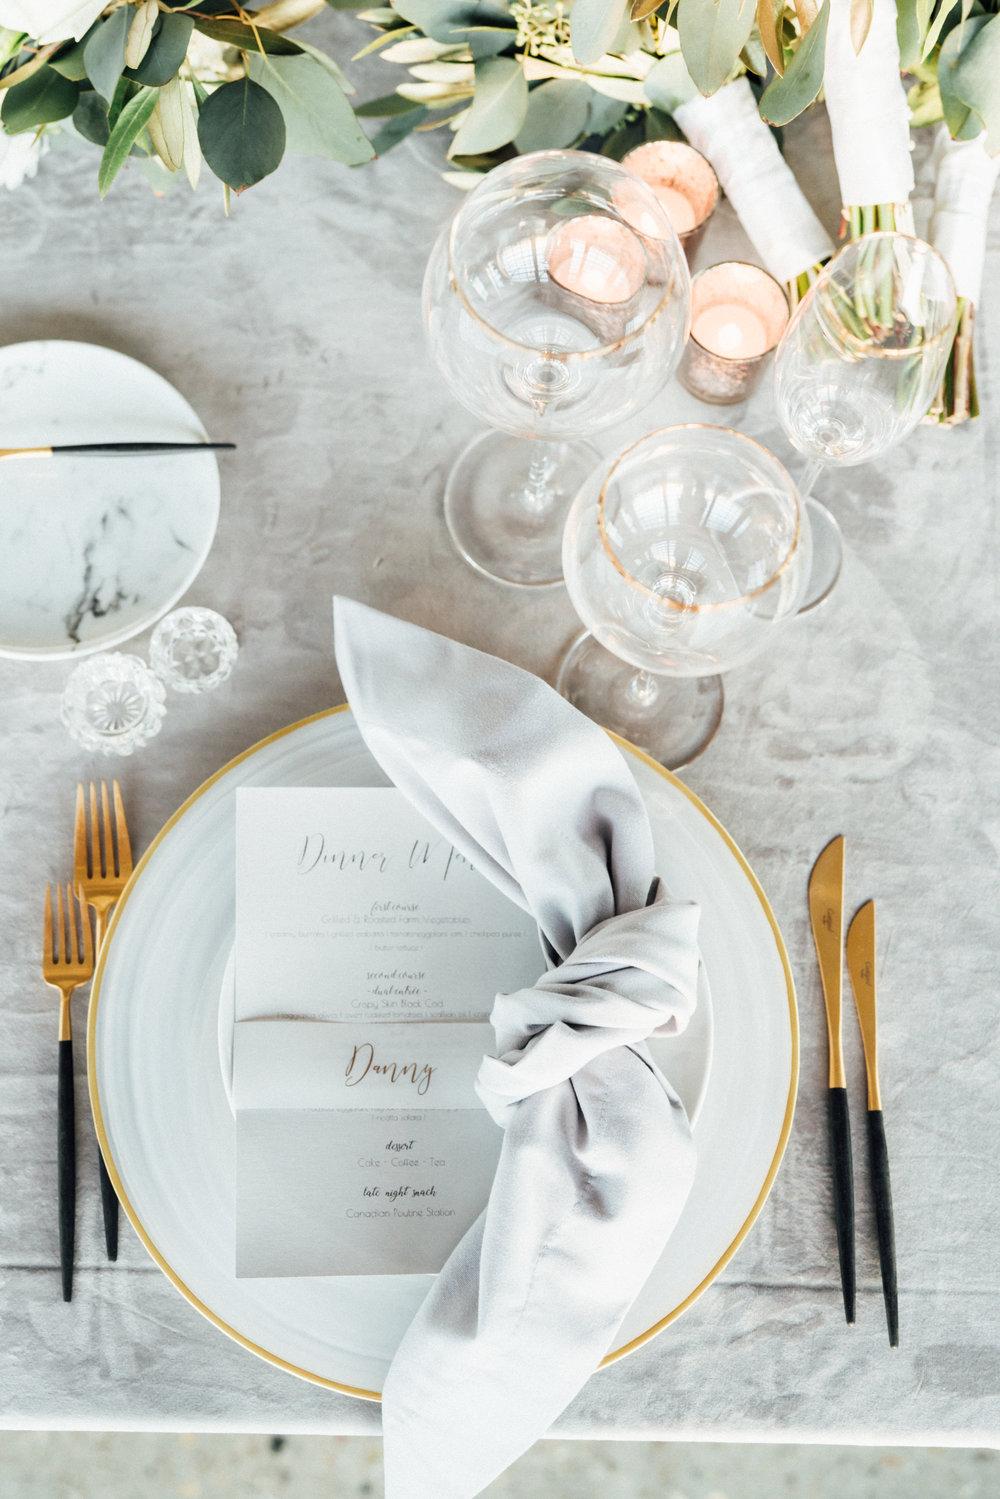 853 Anna _ Danny Wedding DSC07969.jpg